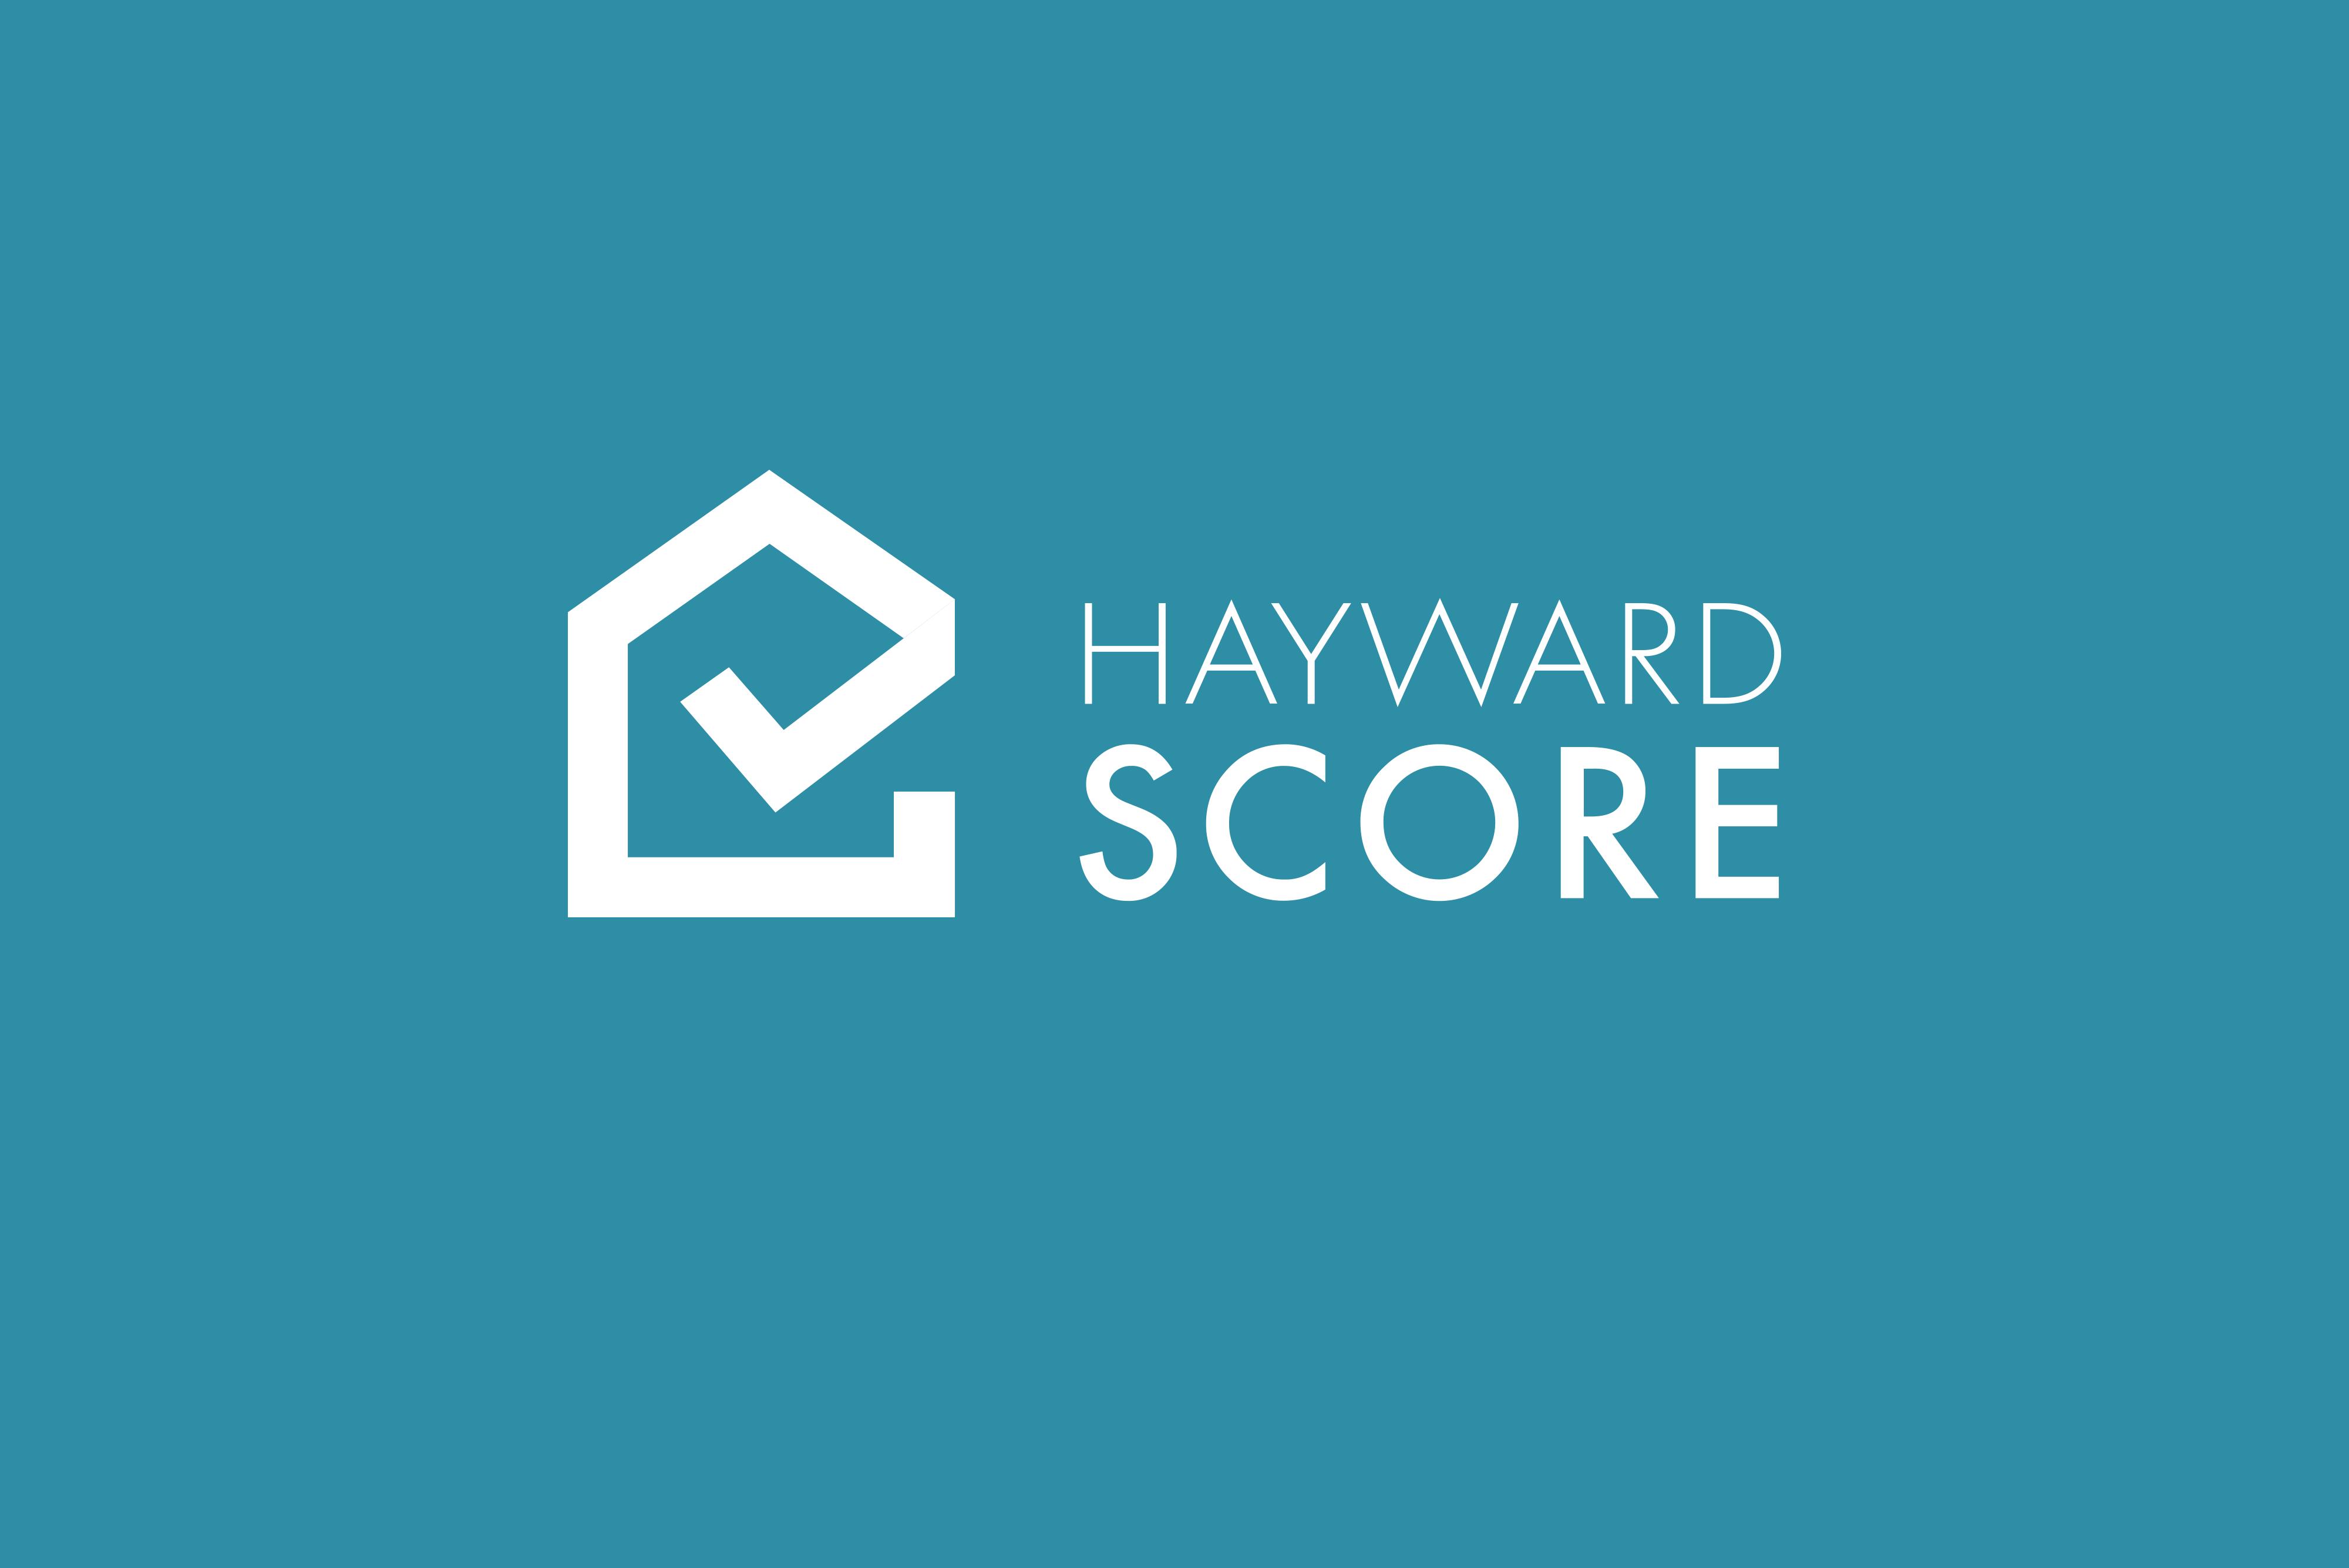 https://s3-us-west-1.amazonaws.com/media.haywardscore.com/wp-content/uploads/2020/04/02203834/hayward_blog-featured.png